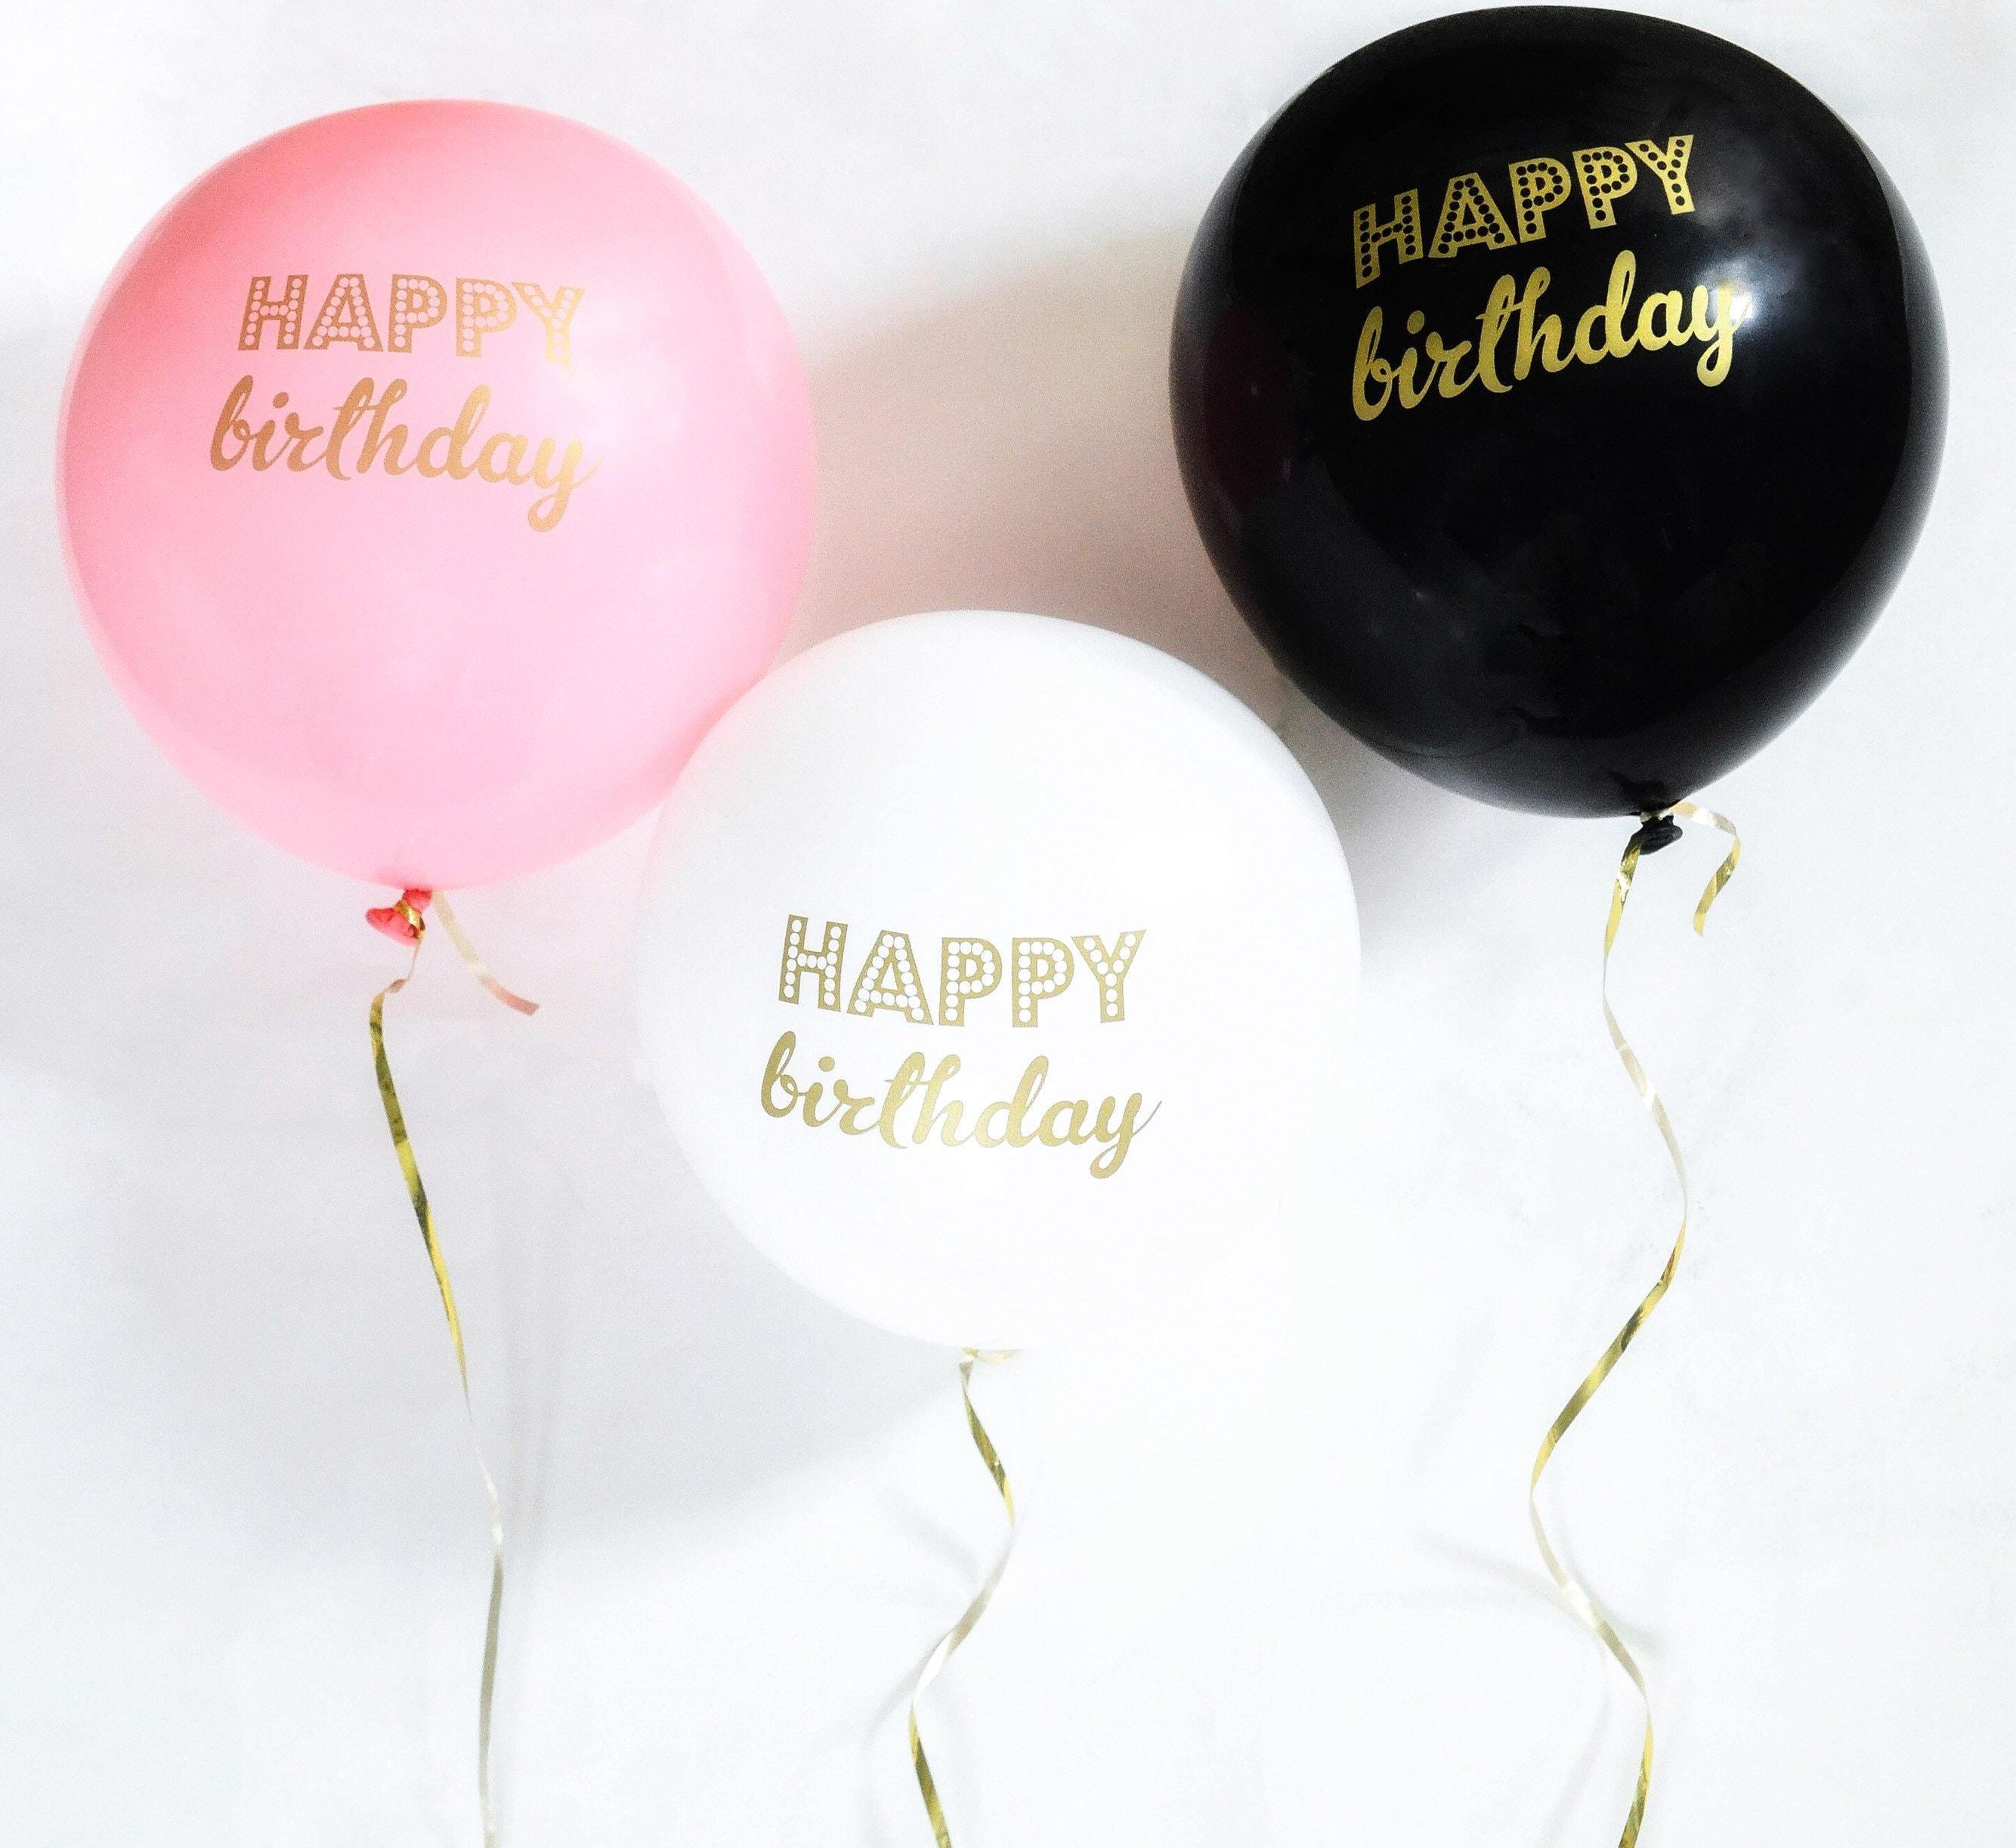 Happy Birthday Balloons Birthday Party Decorations 30th